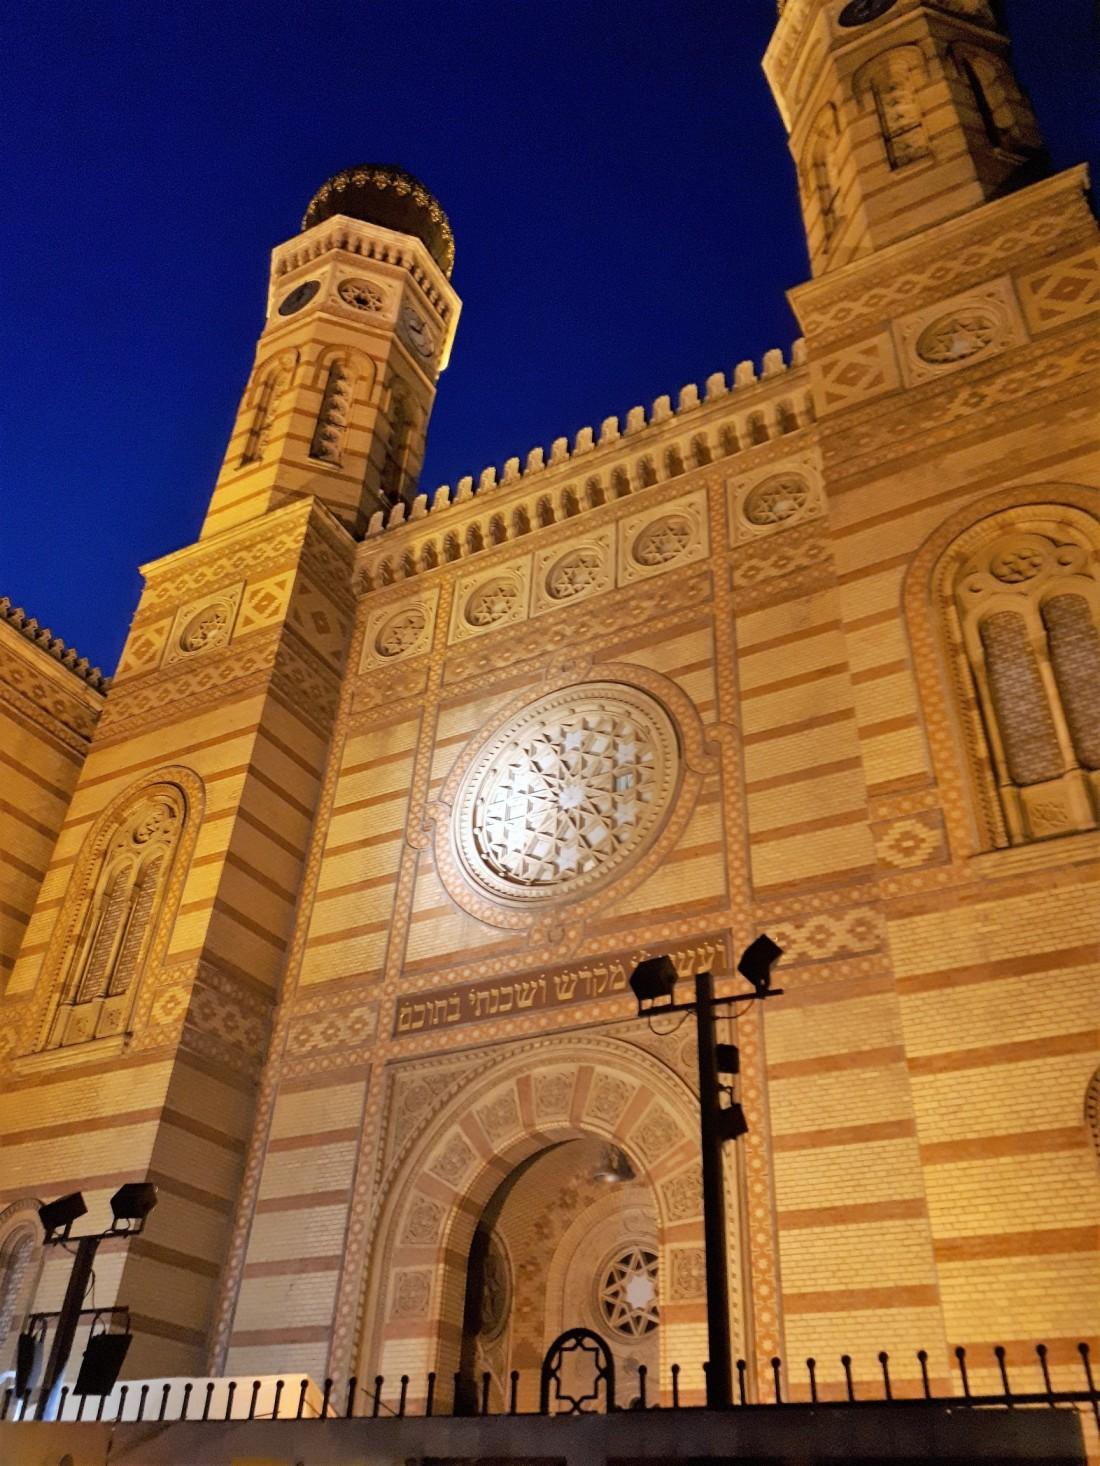 Hungary_budapest_jewish_synagogue